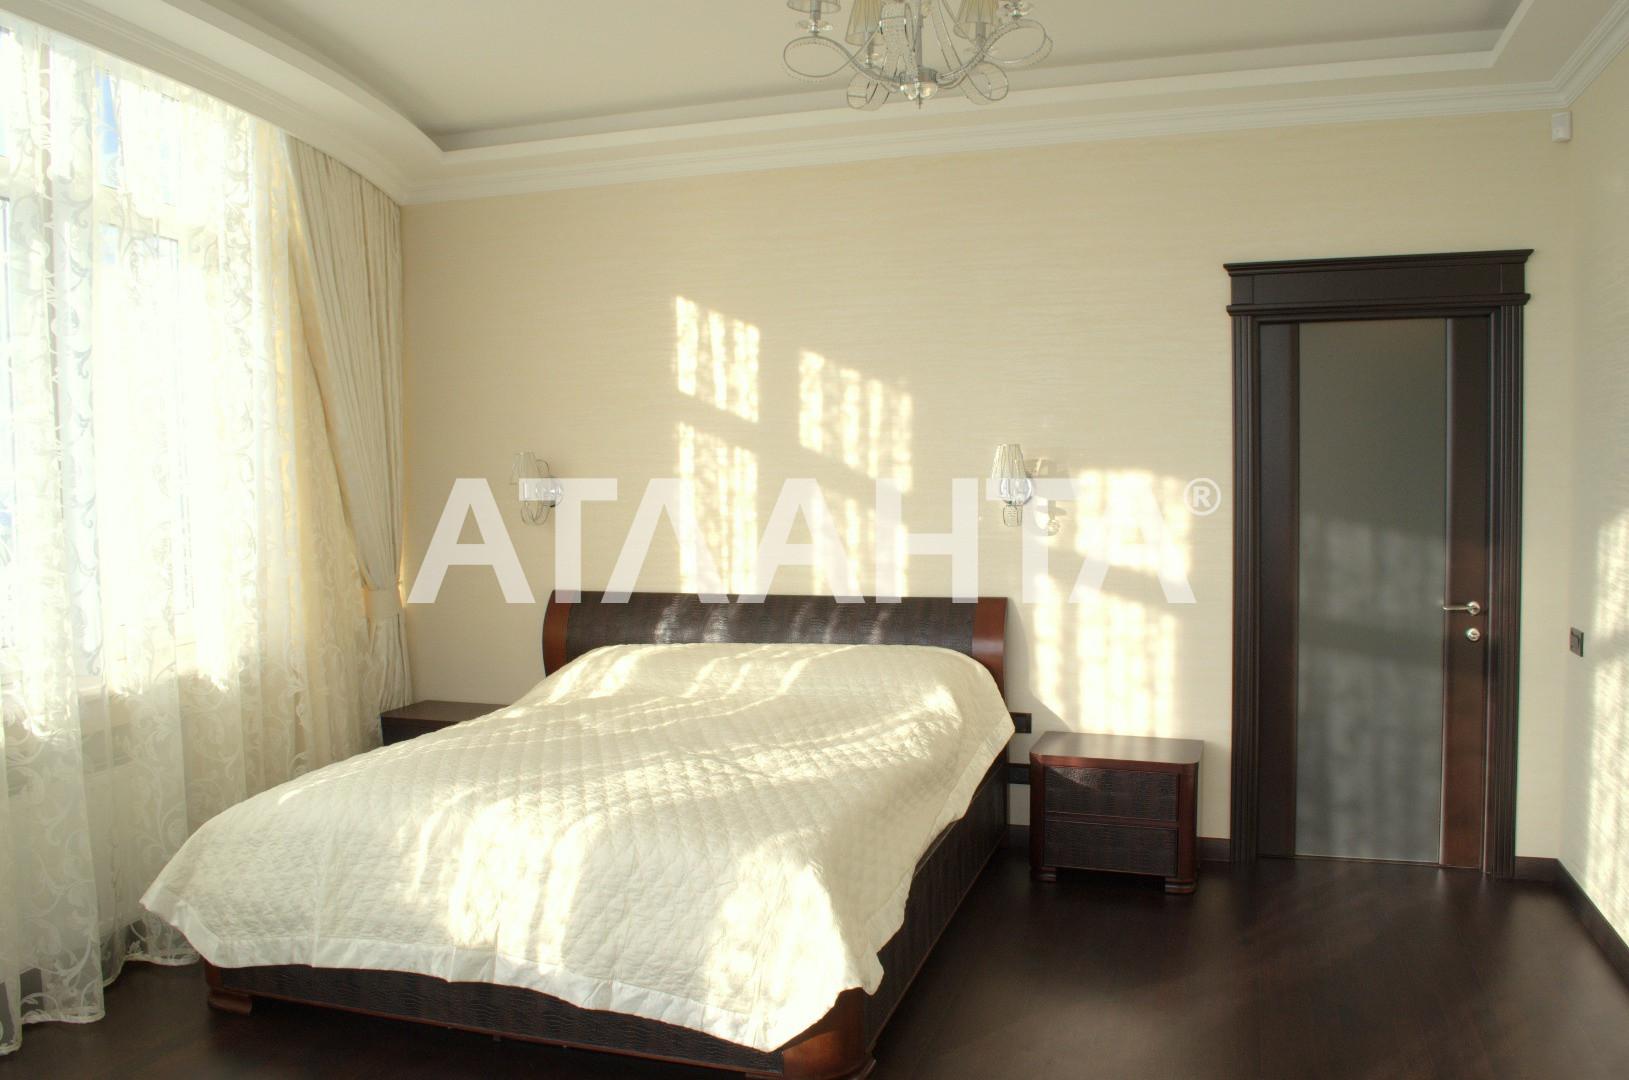 Продается 4-комнатная Квартира на ул. Французский Бул. (Пролетарский Бул.) — 350 000 у.е. (фото №6)